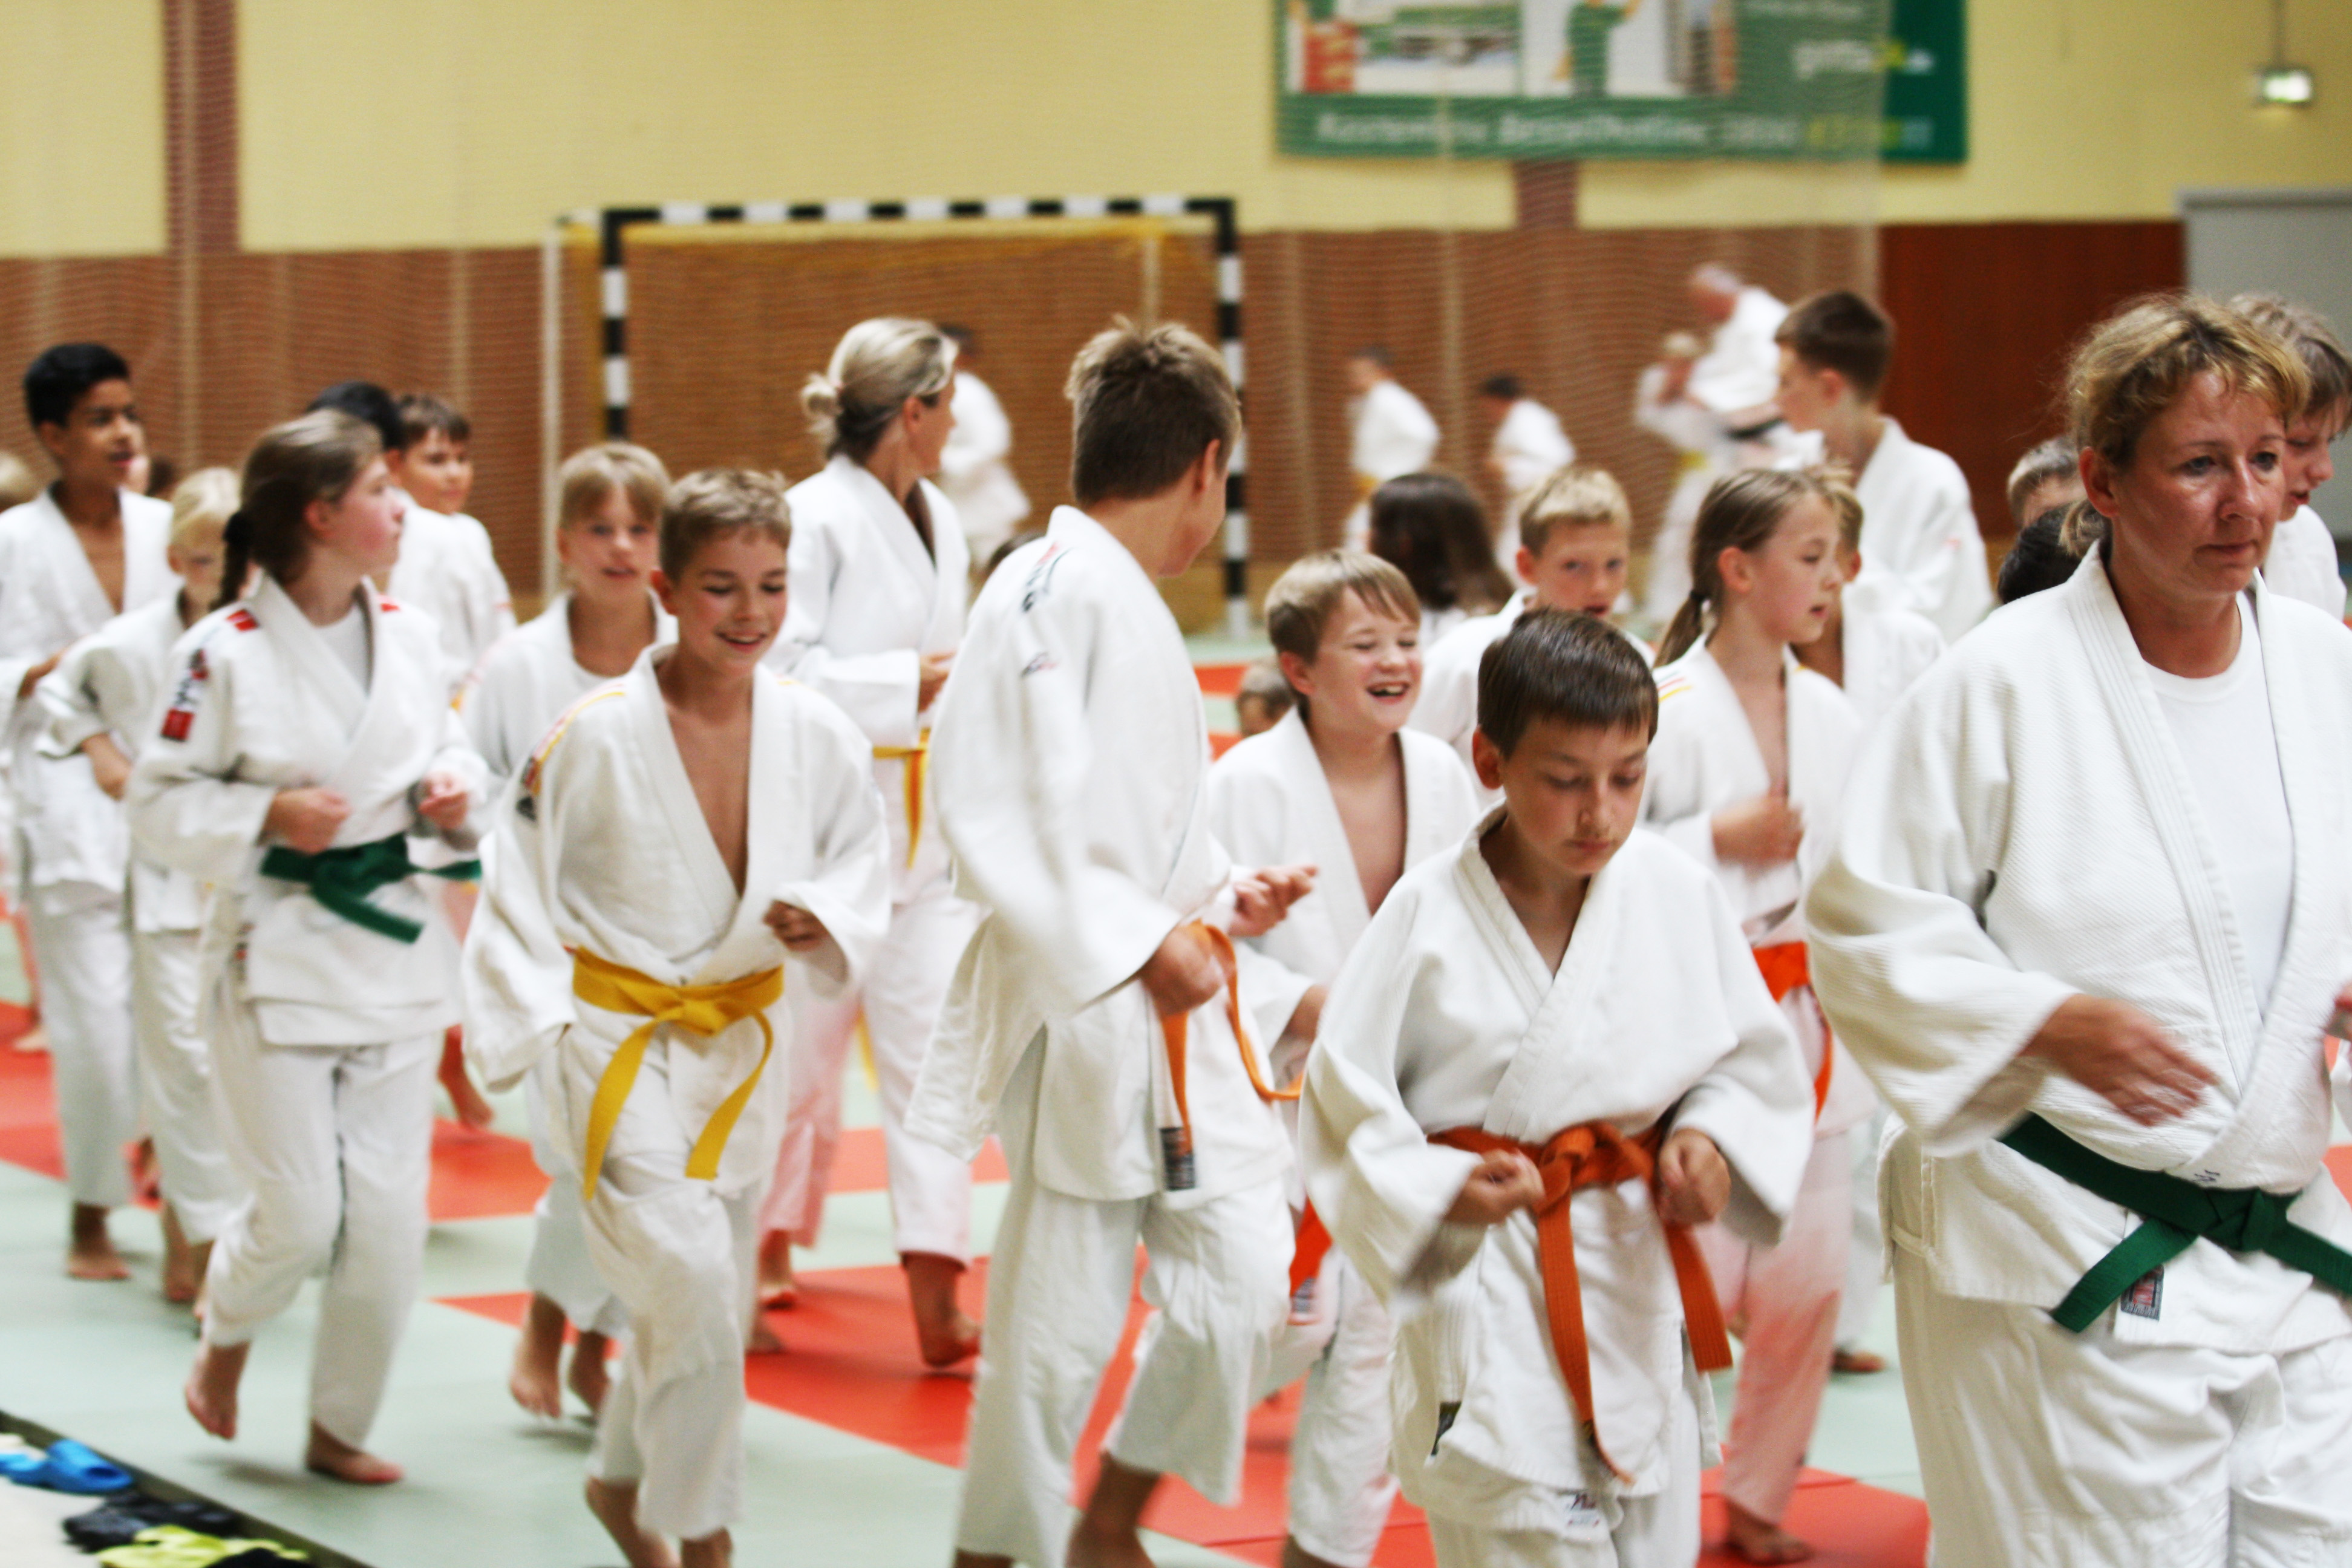 Judoka beim Aufwärmen